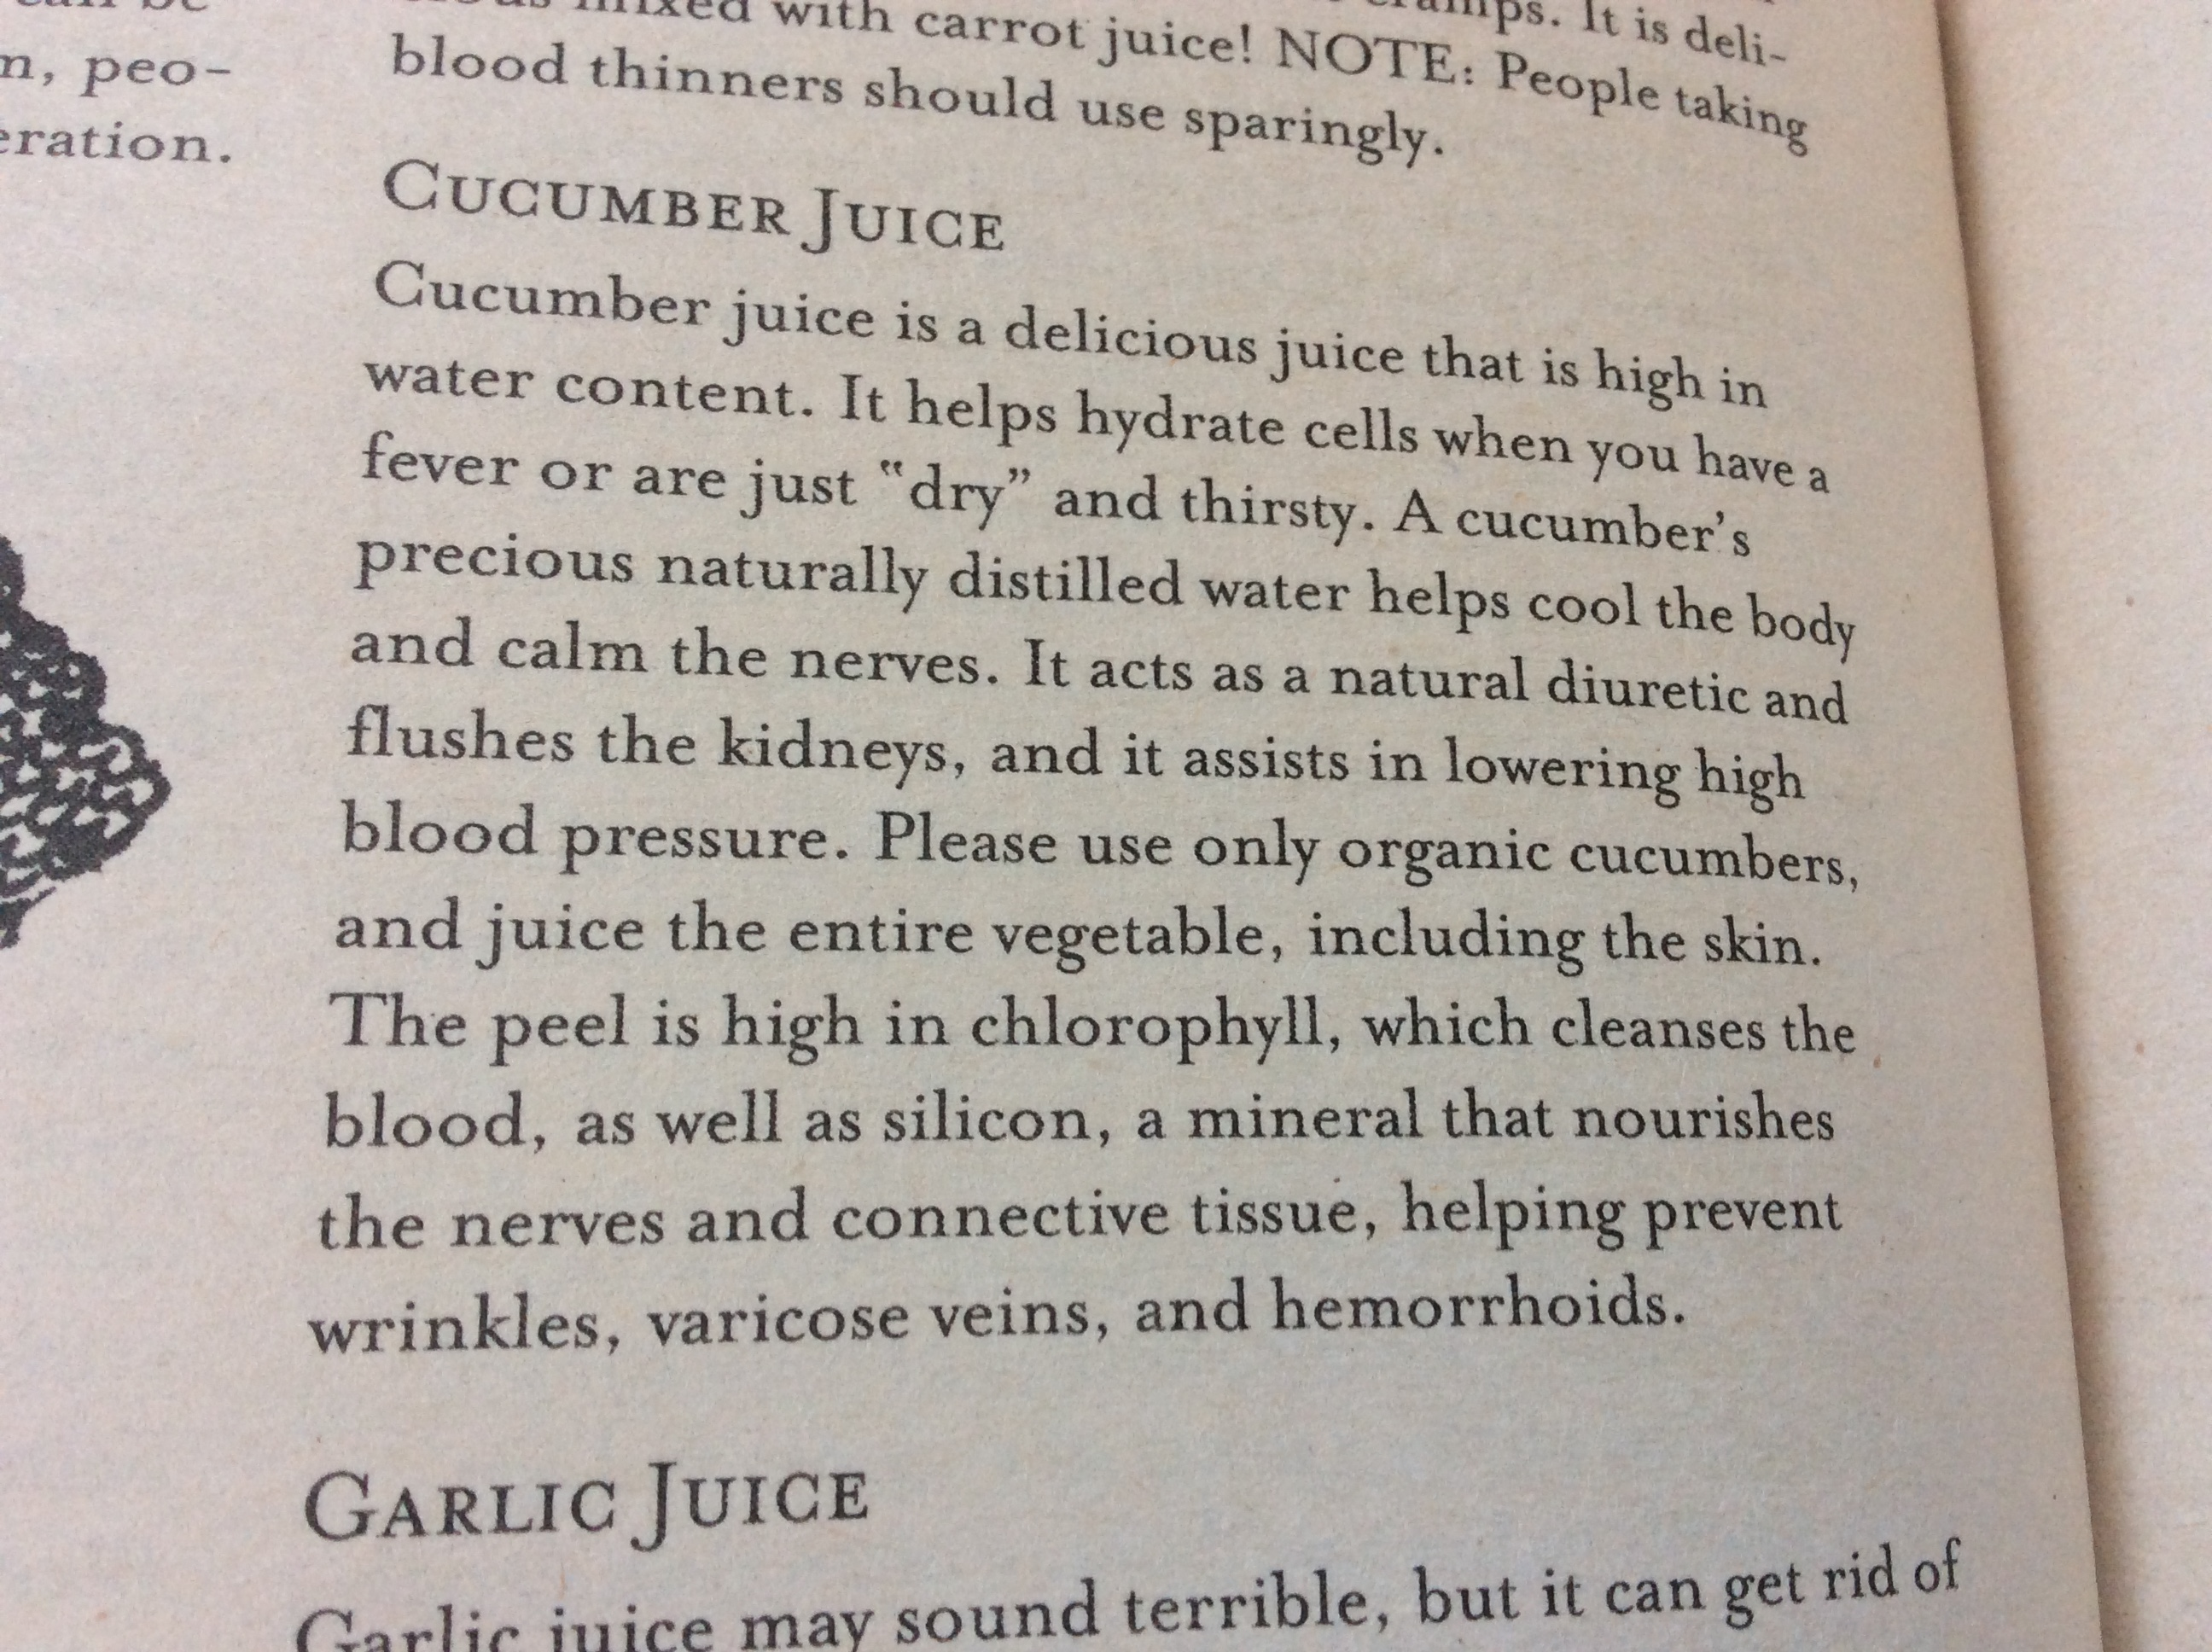 vegetable juicing tips Cucumber